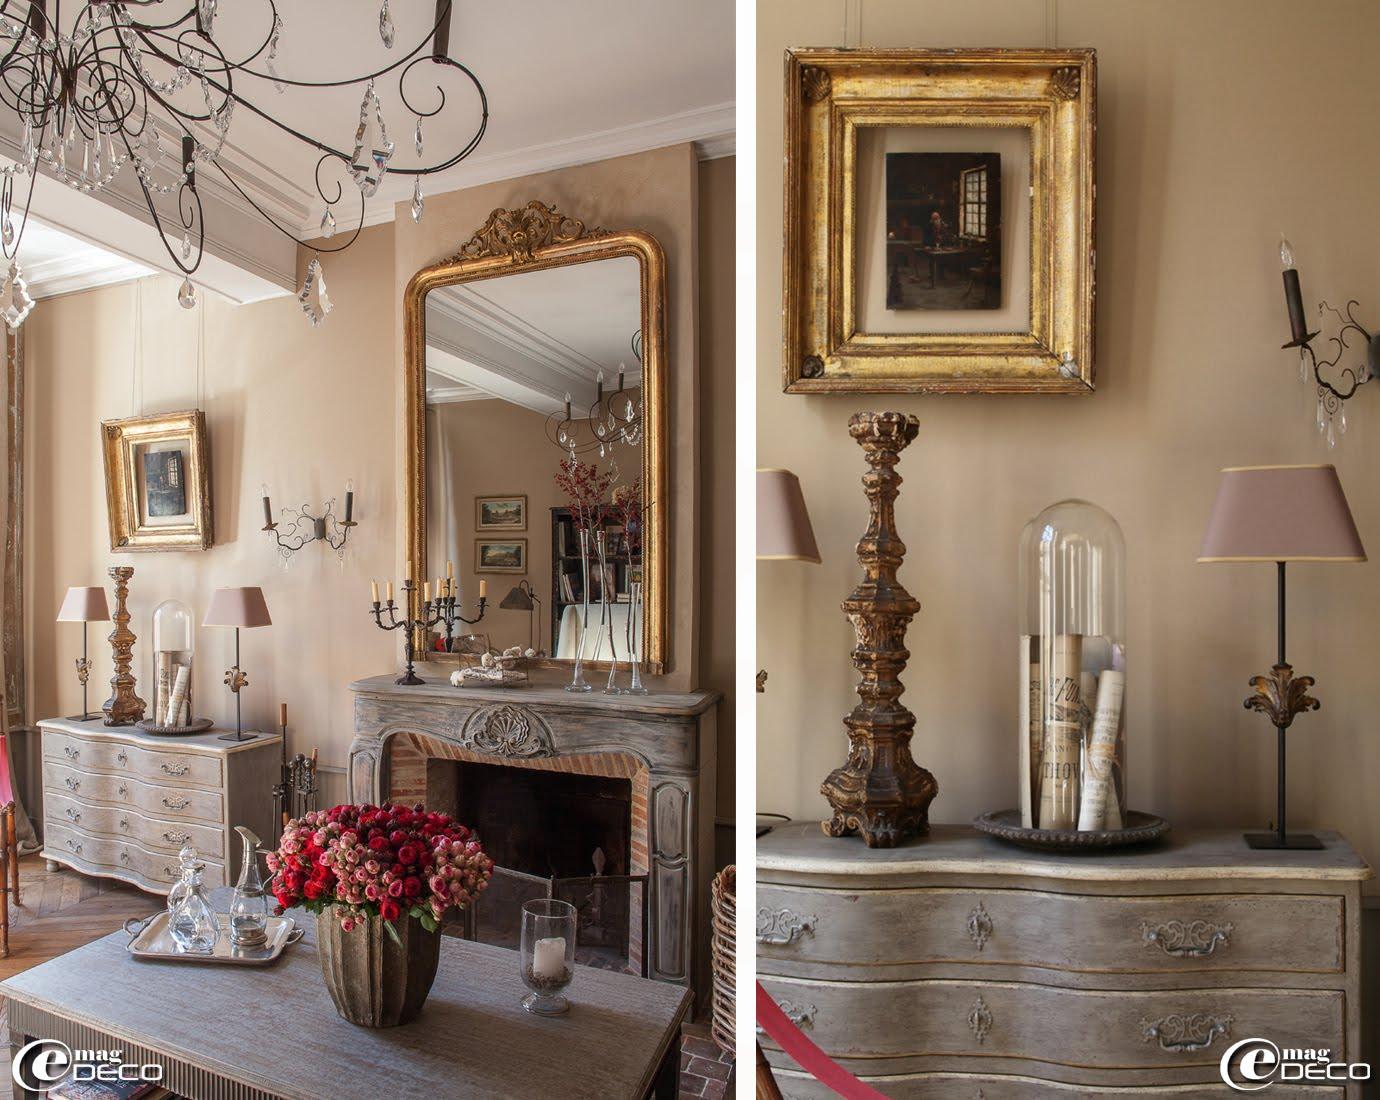 miroir pomax. Black Bedroom Furniture Sets. Home Design Ideas